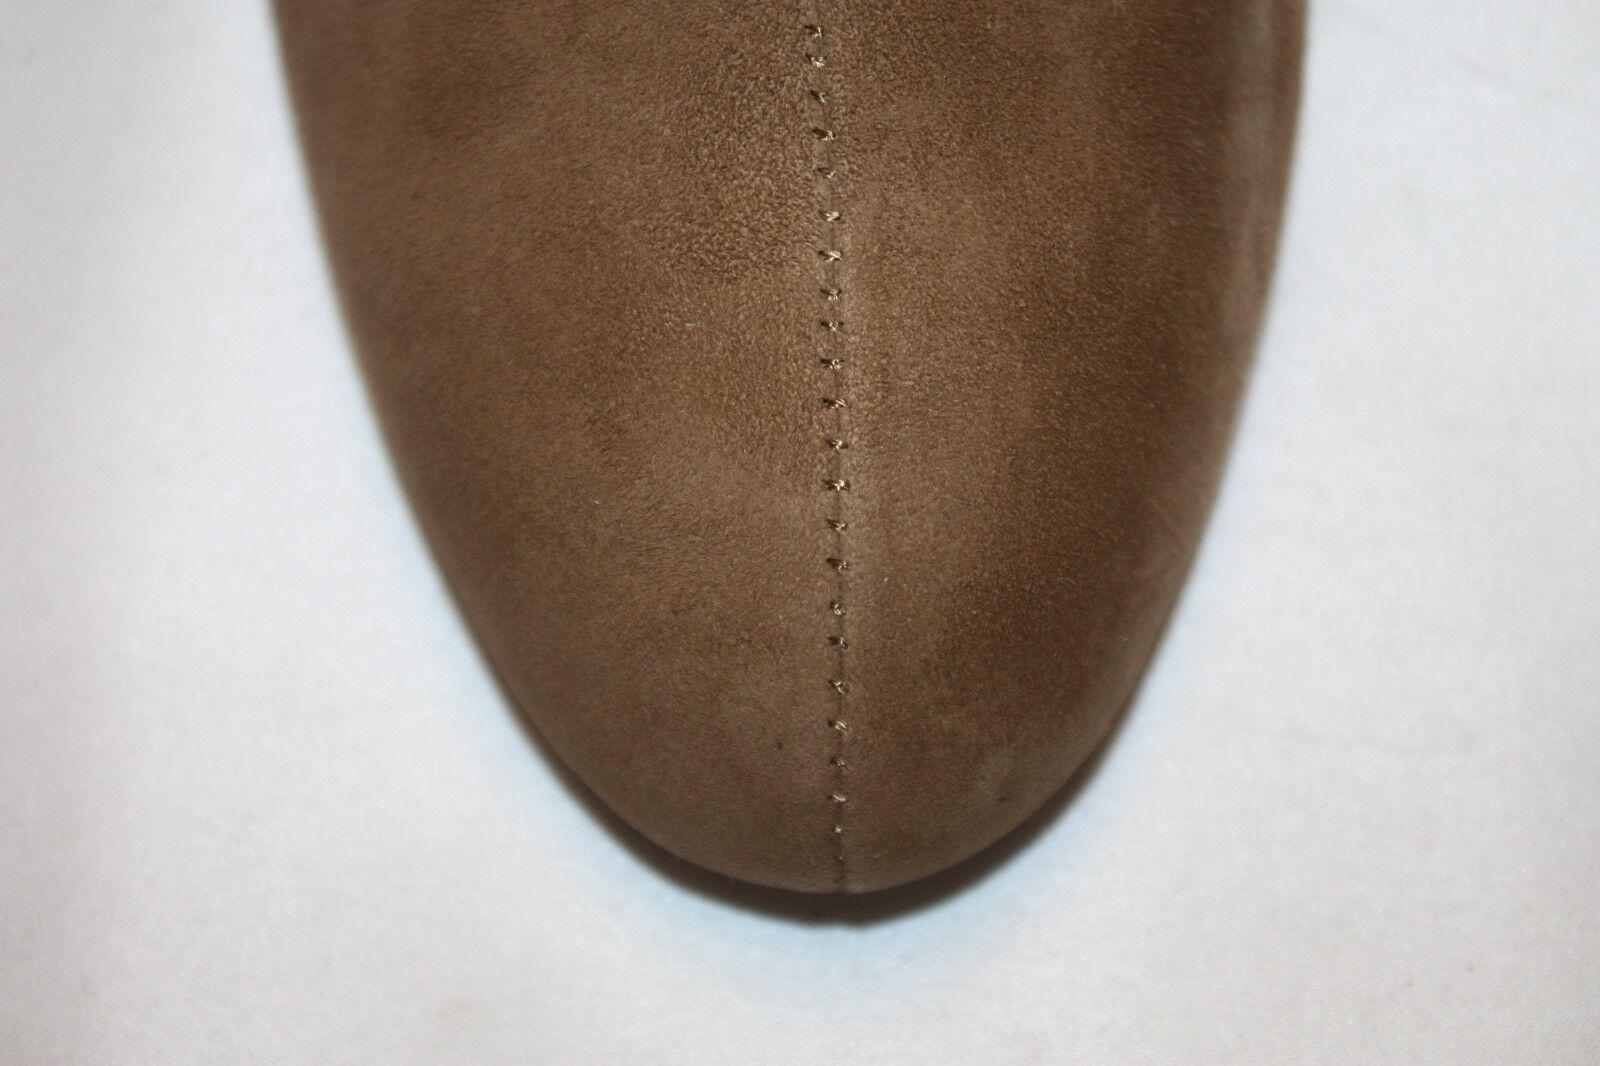 Nuevo  nuevo En Caja  botas Jean-Michel Cazabat Noni Tuerca Gamuza Cremallera Lateral botas  al Tobillo EU41  450 aaa6c8